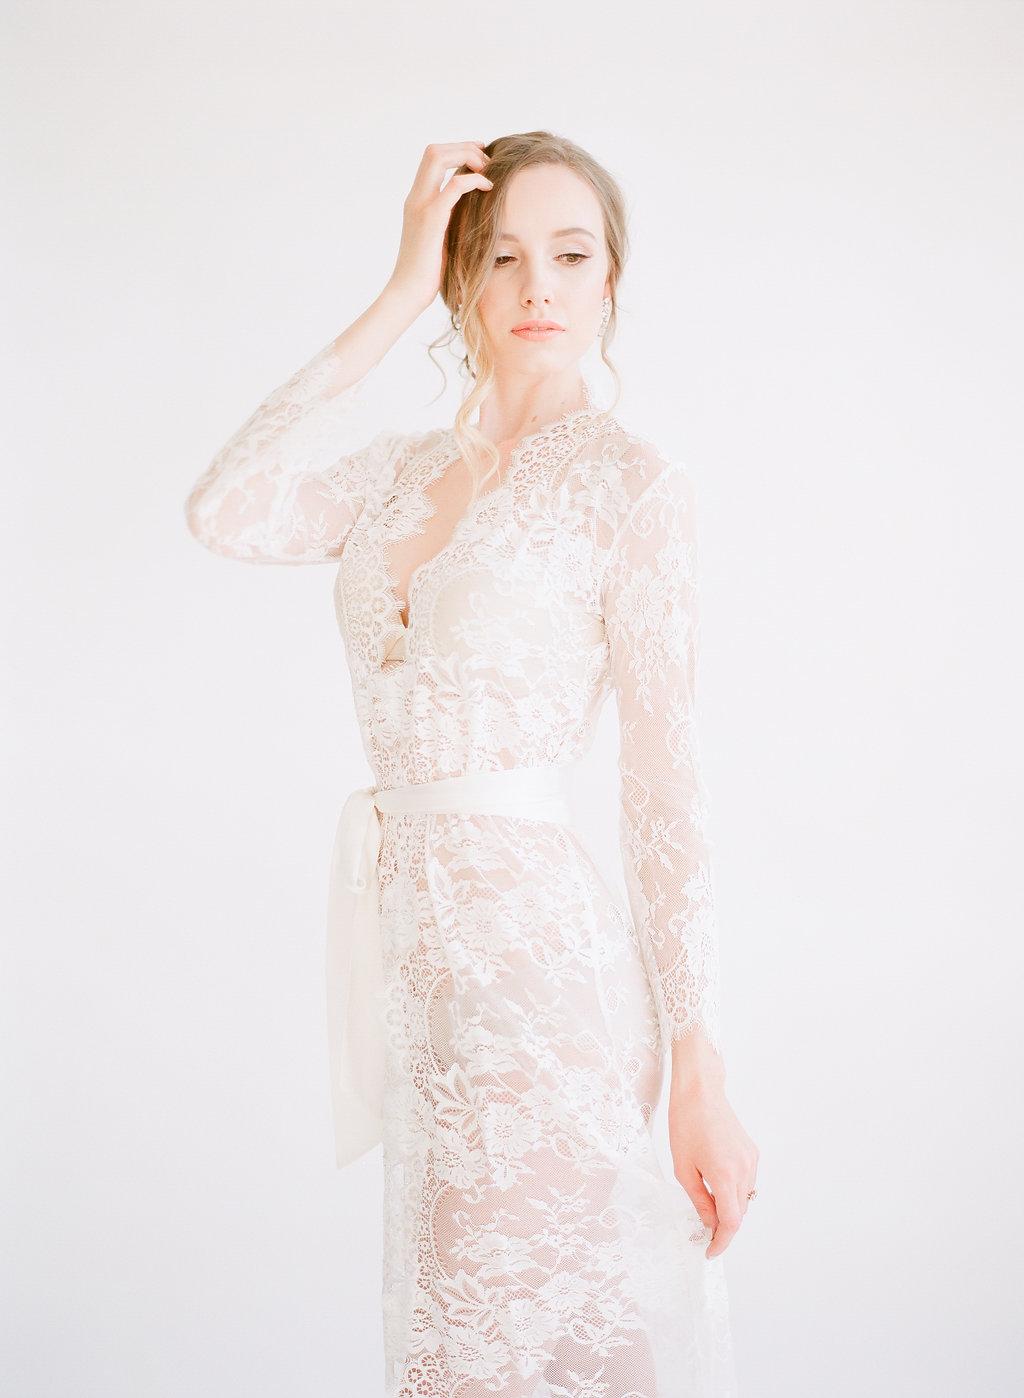 Neutral Wedding Inspiration | McCune Photography | Chloe + Mint | Beige Wedding | Fine Art Wedding Blog | Canadian Wedding | Joy Wed | Stacey Foley Design